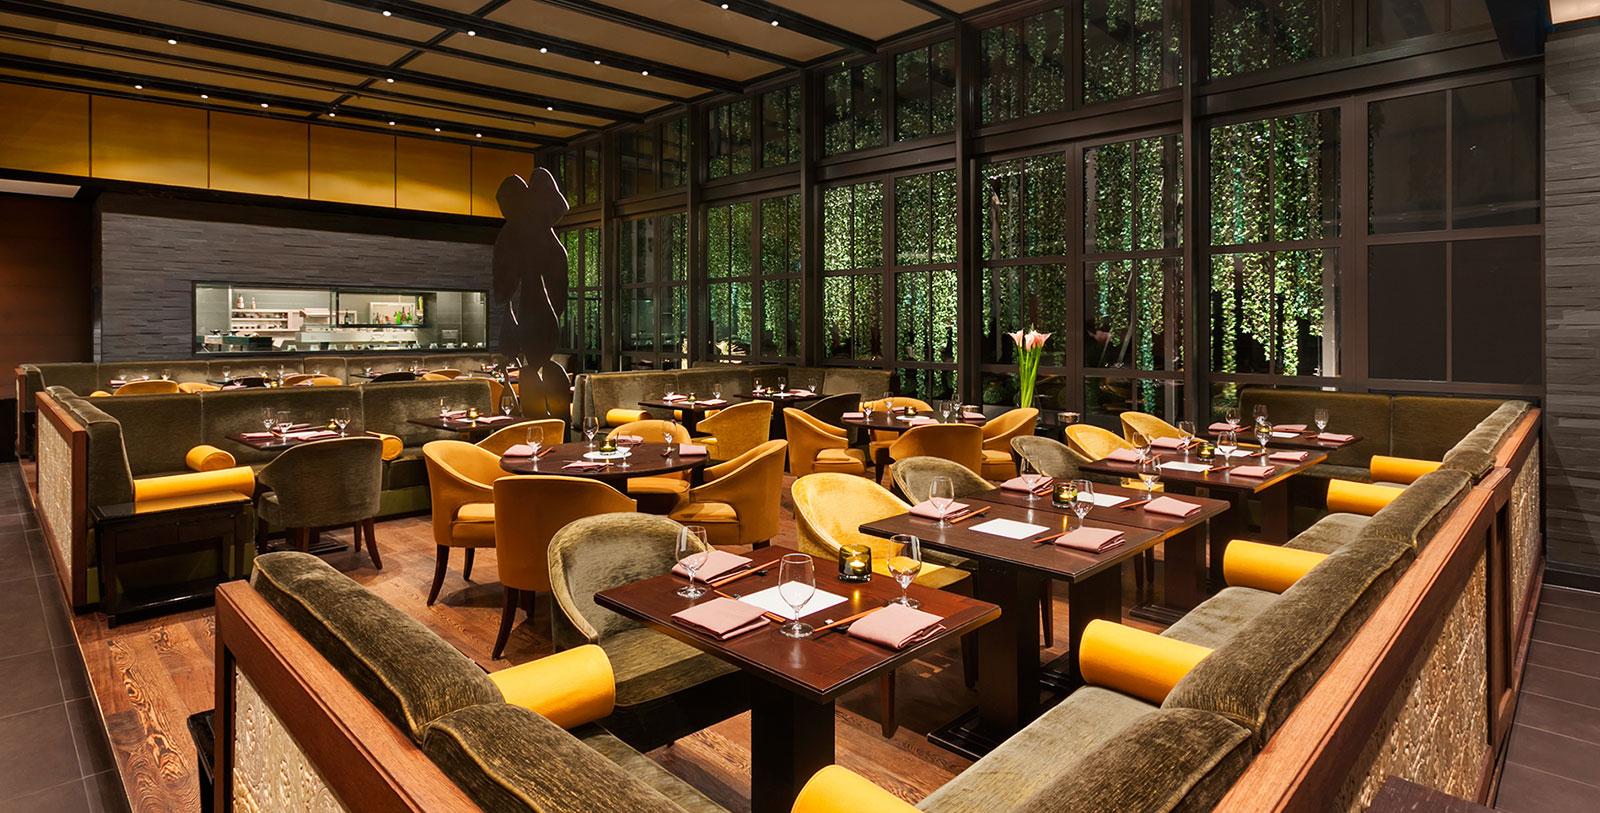 Image of Sra Bua Dining Room, Hotel Adlon Kempinski, Berlin, Germany, 1907, Member of Historic Hotels Worldwide, Dining